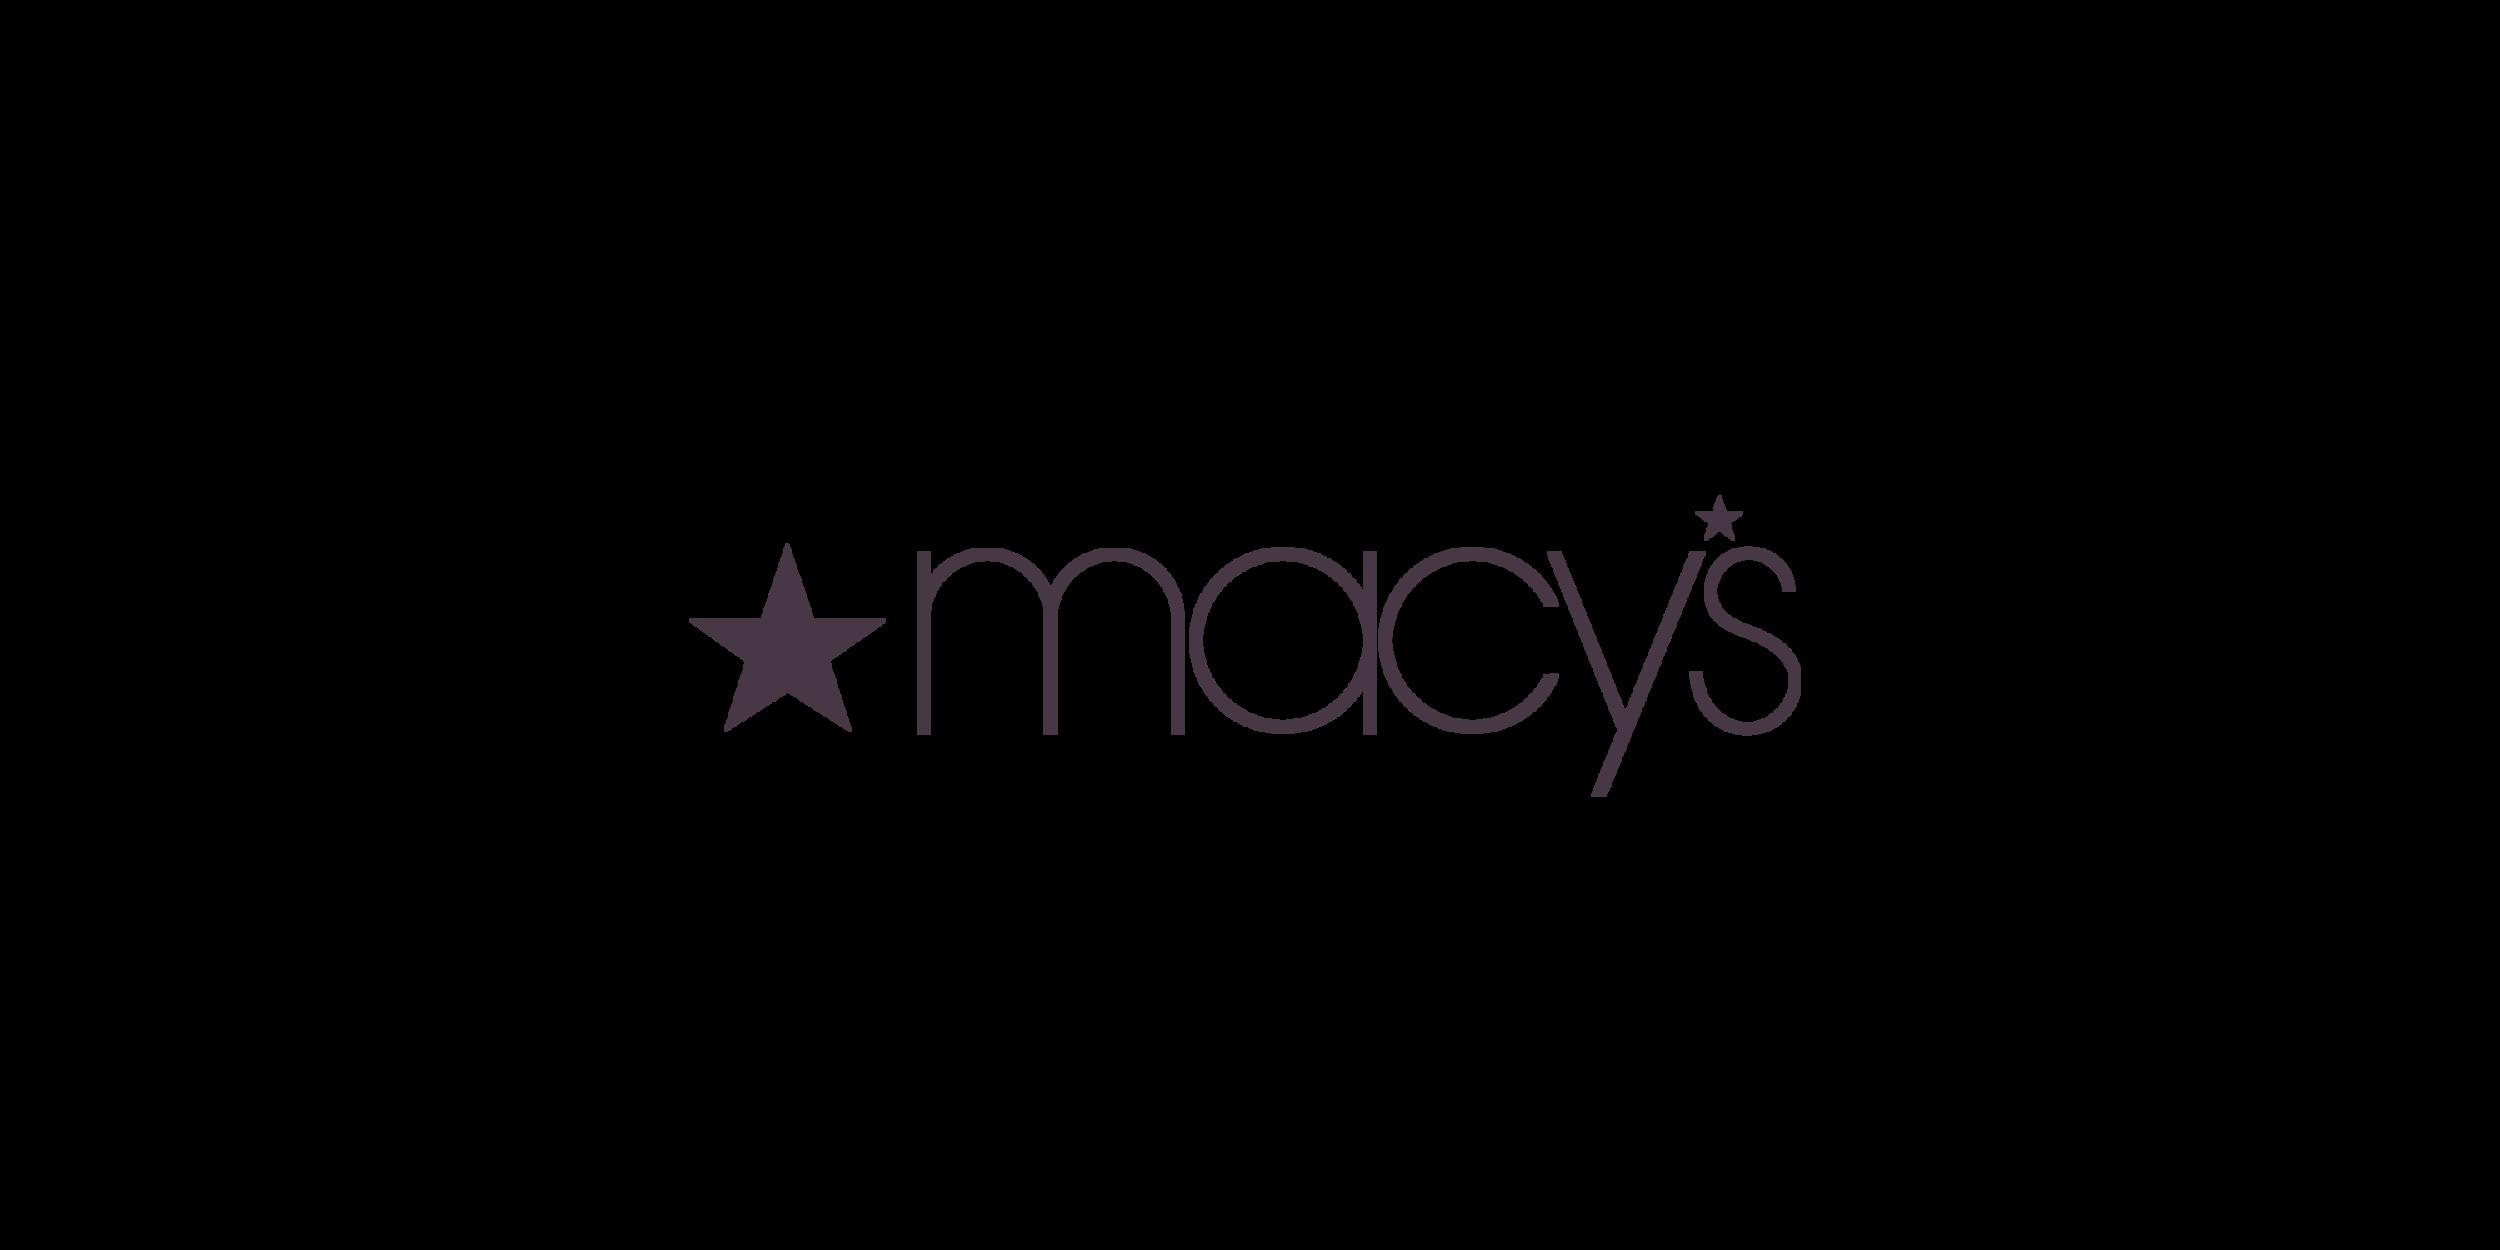 LBD_Carousel_Logo_Macys-01.png